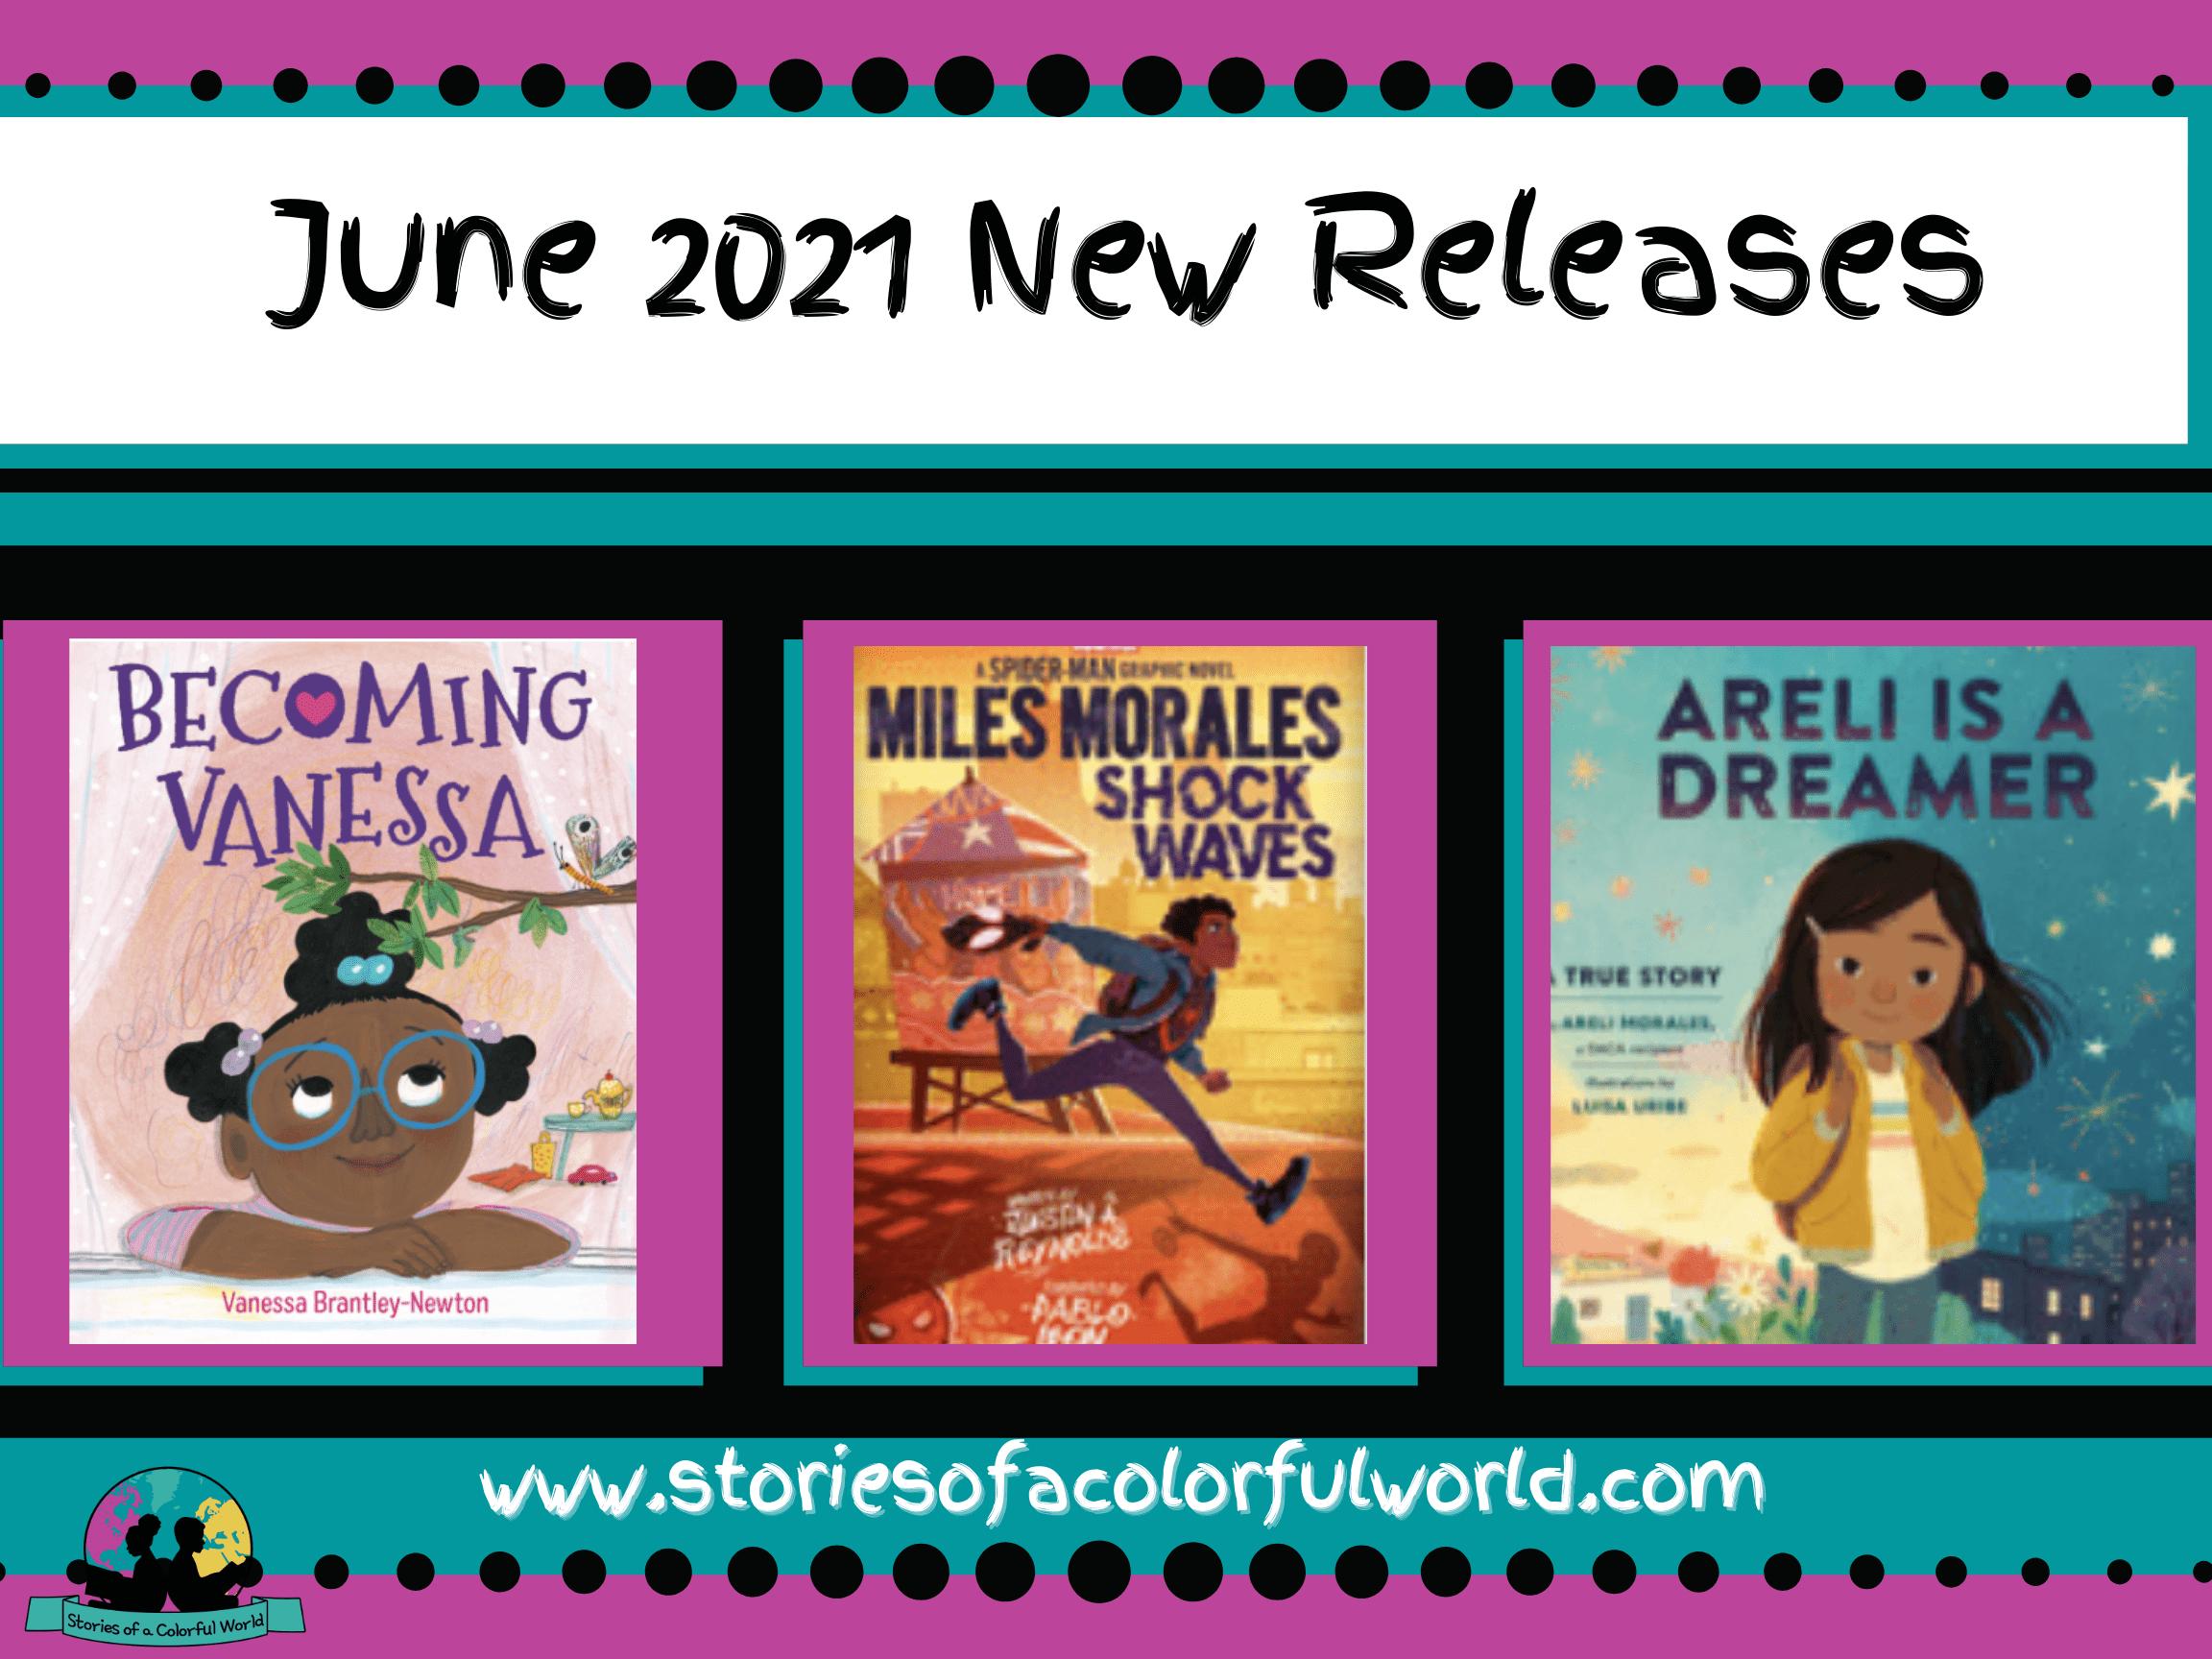 June 2021 New Book Releases